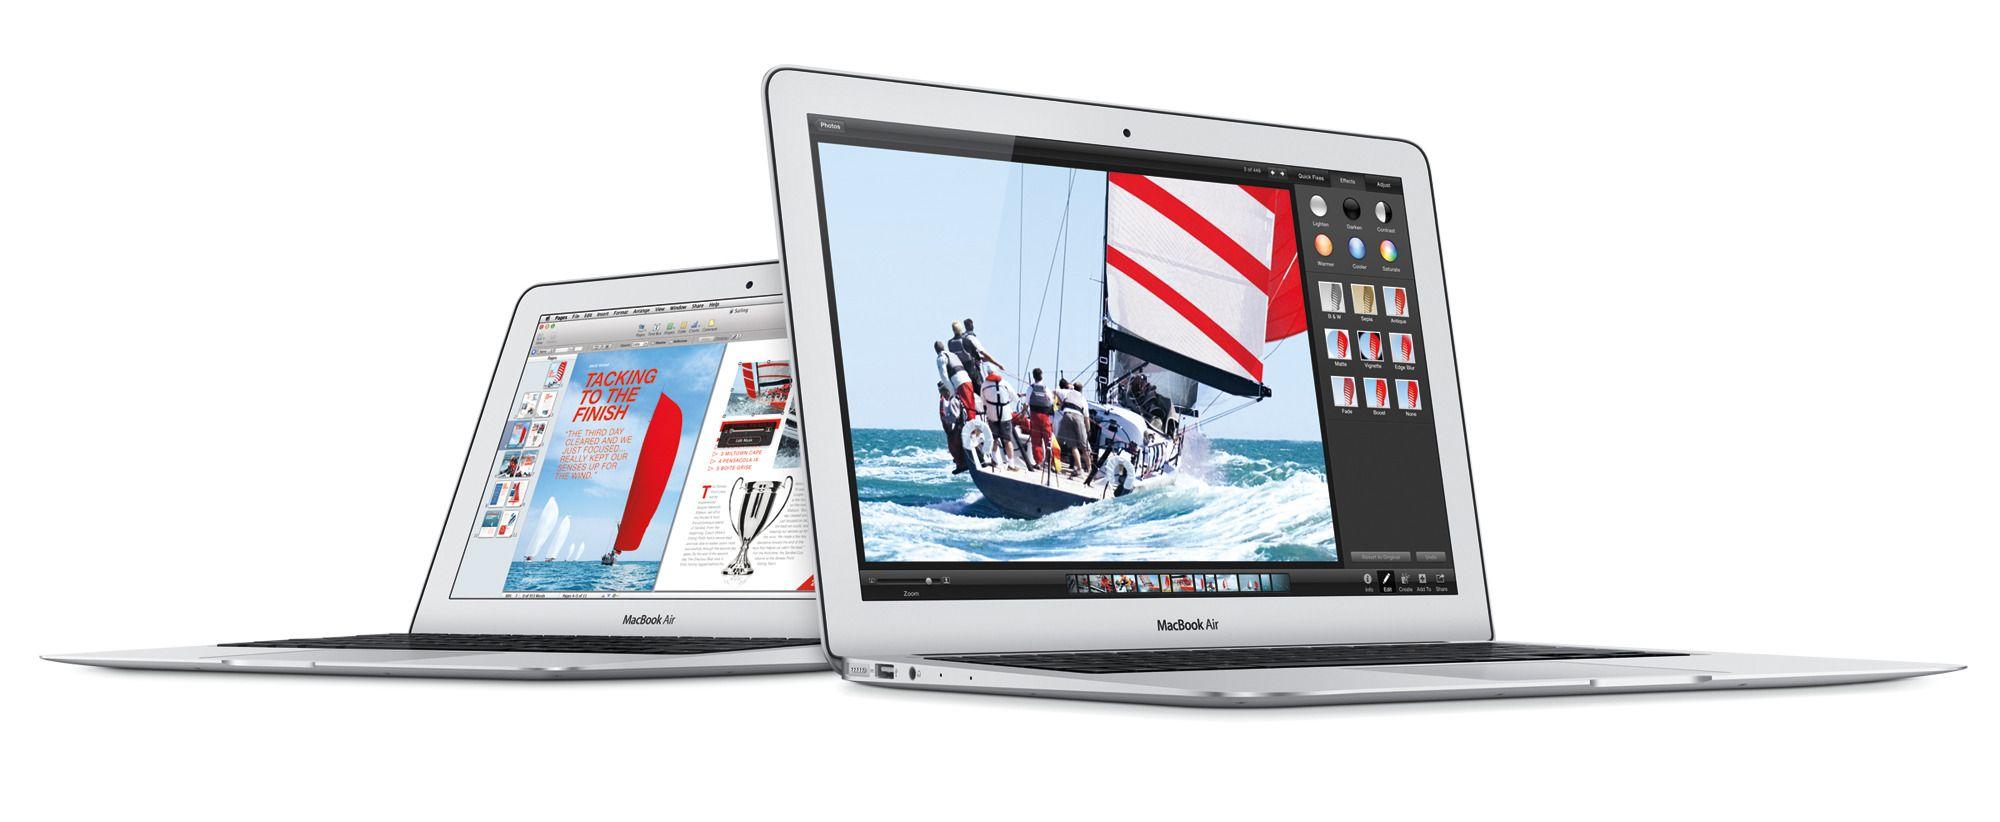 MacBook Air kommer trolig i Retina-utgave.Foto: Apple